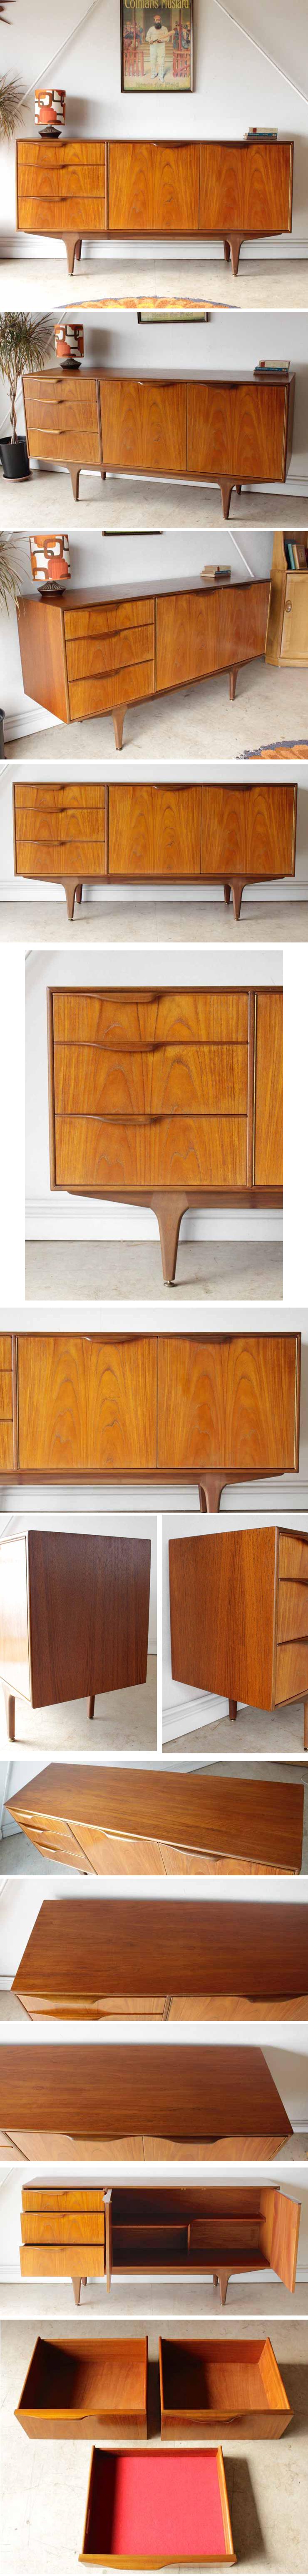 McIntoshマッキントッシュ製ビンテージチーク・サイドボード・テレビボード/イギリス製アンティーク家具ミッドセンチュリー輸入家具